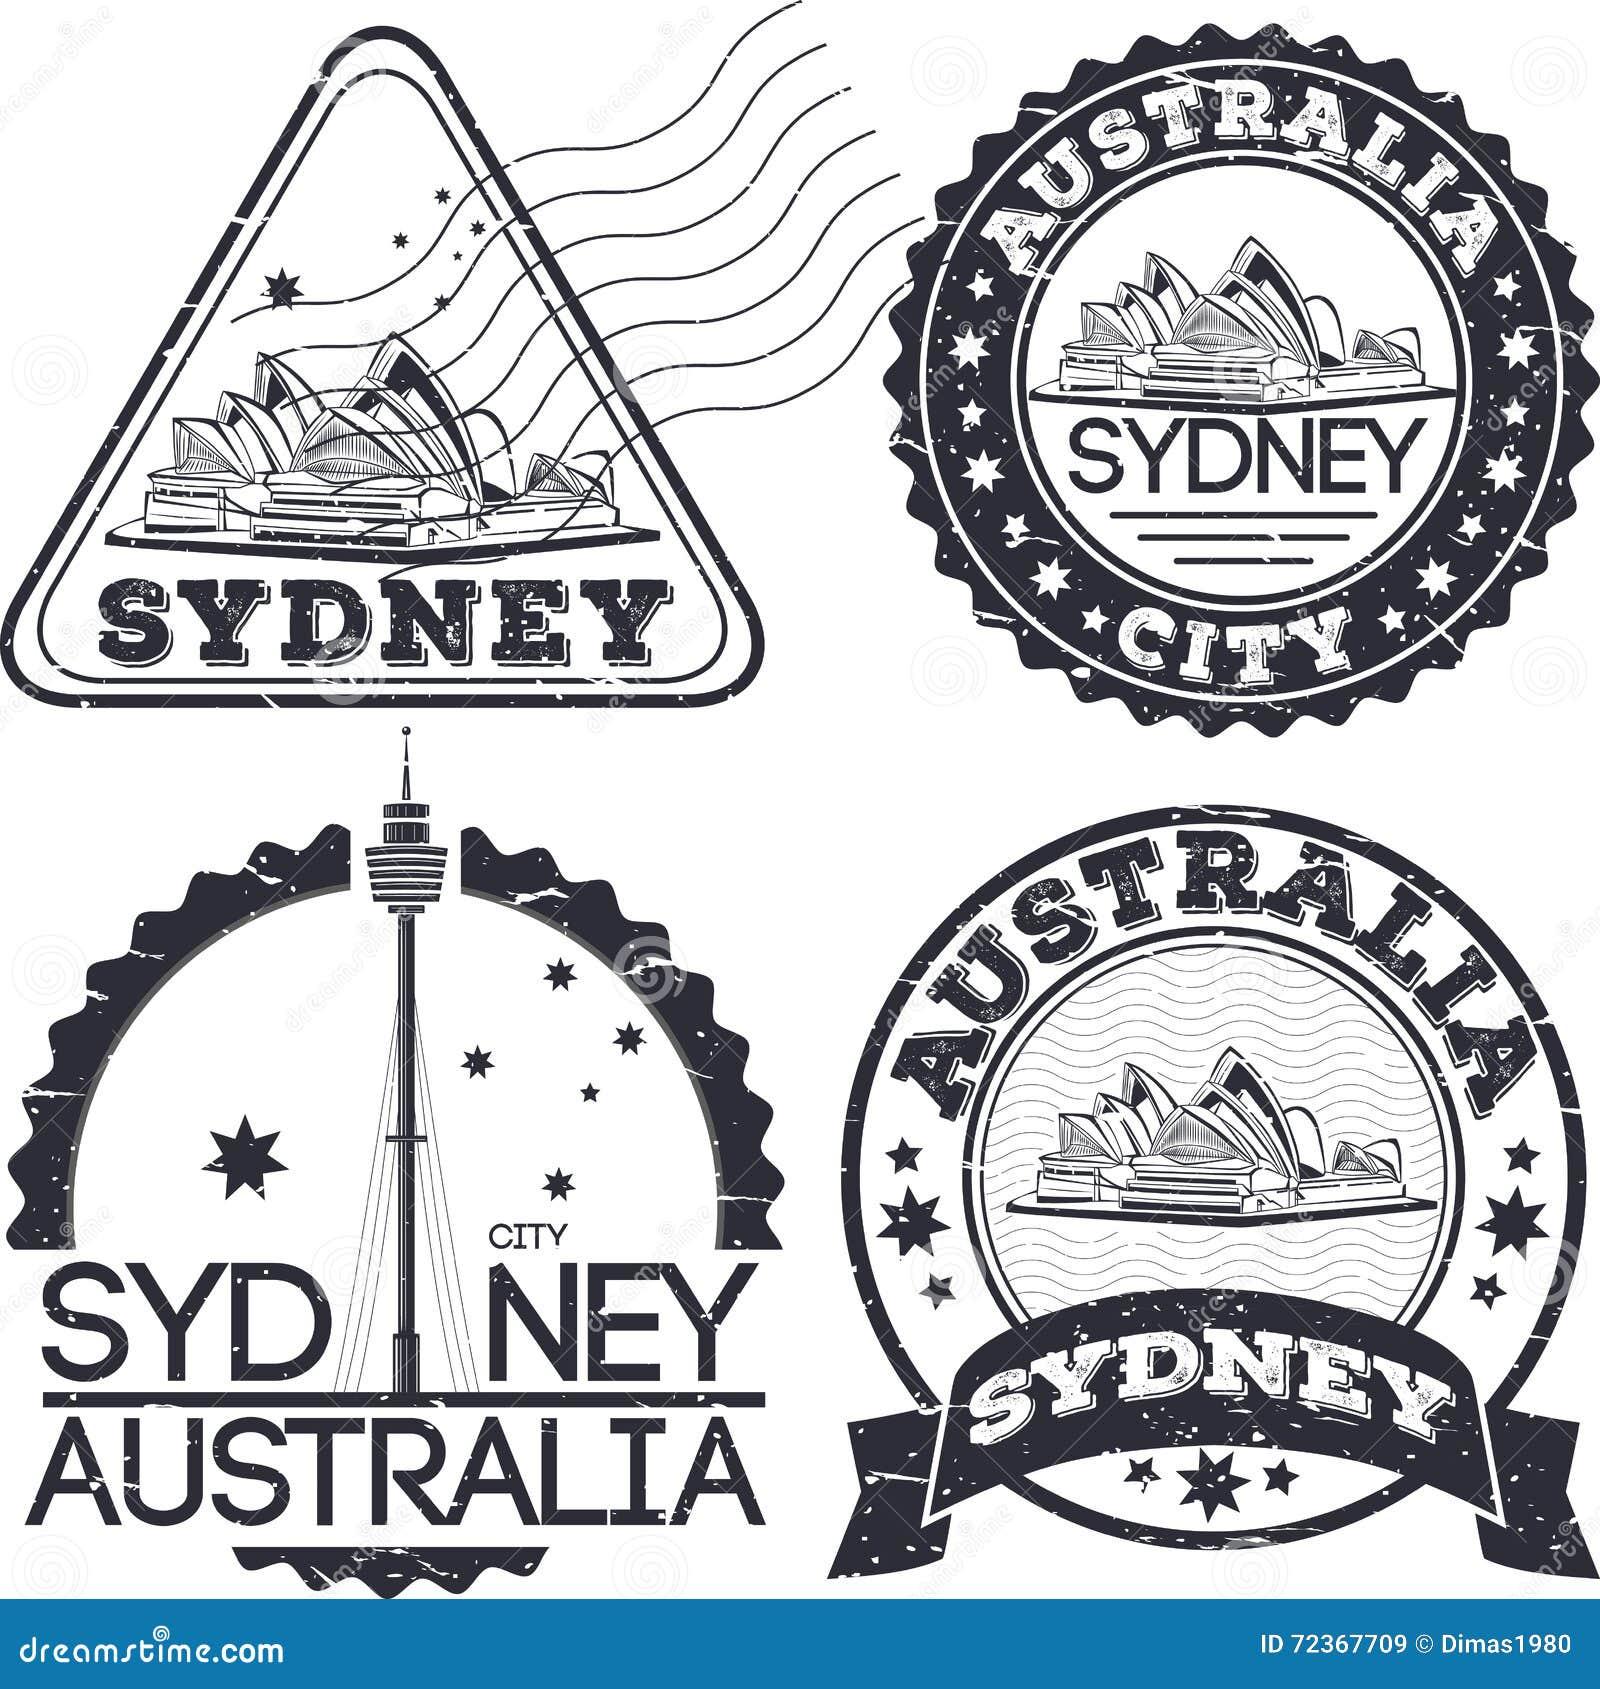 stamp collectors sydney australia time - photo#19